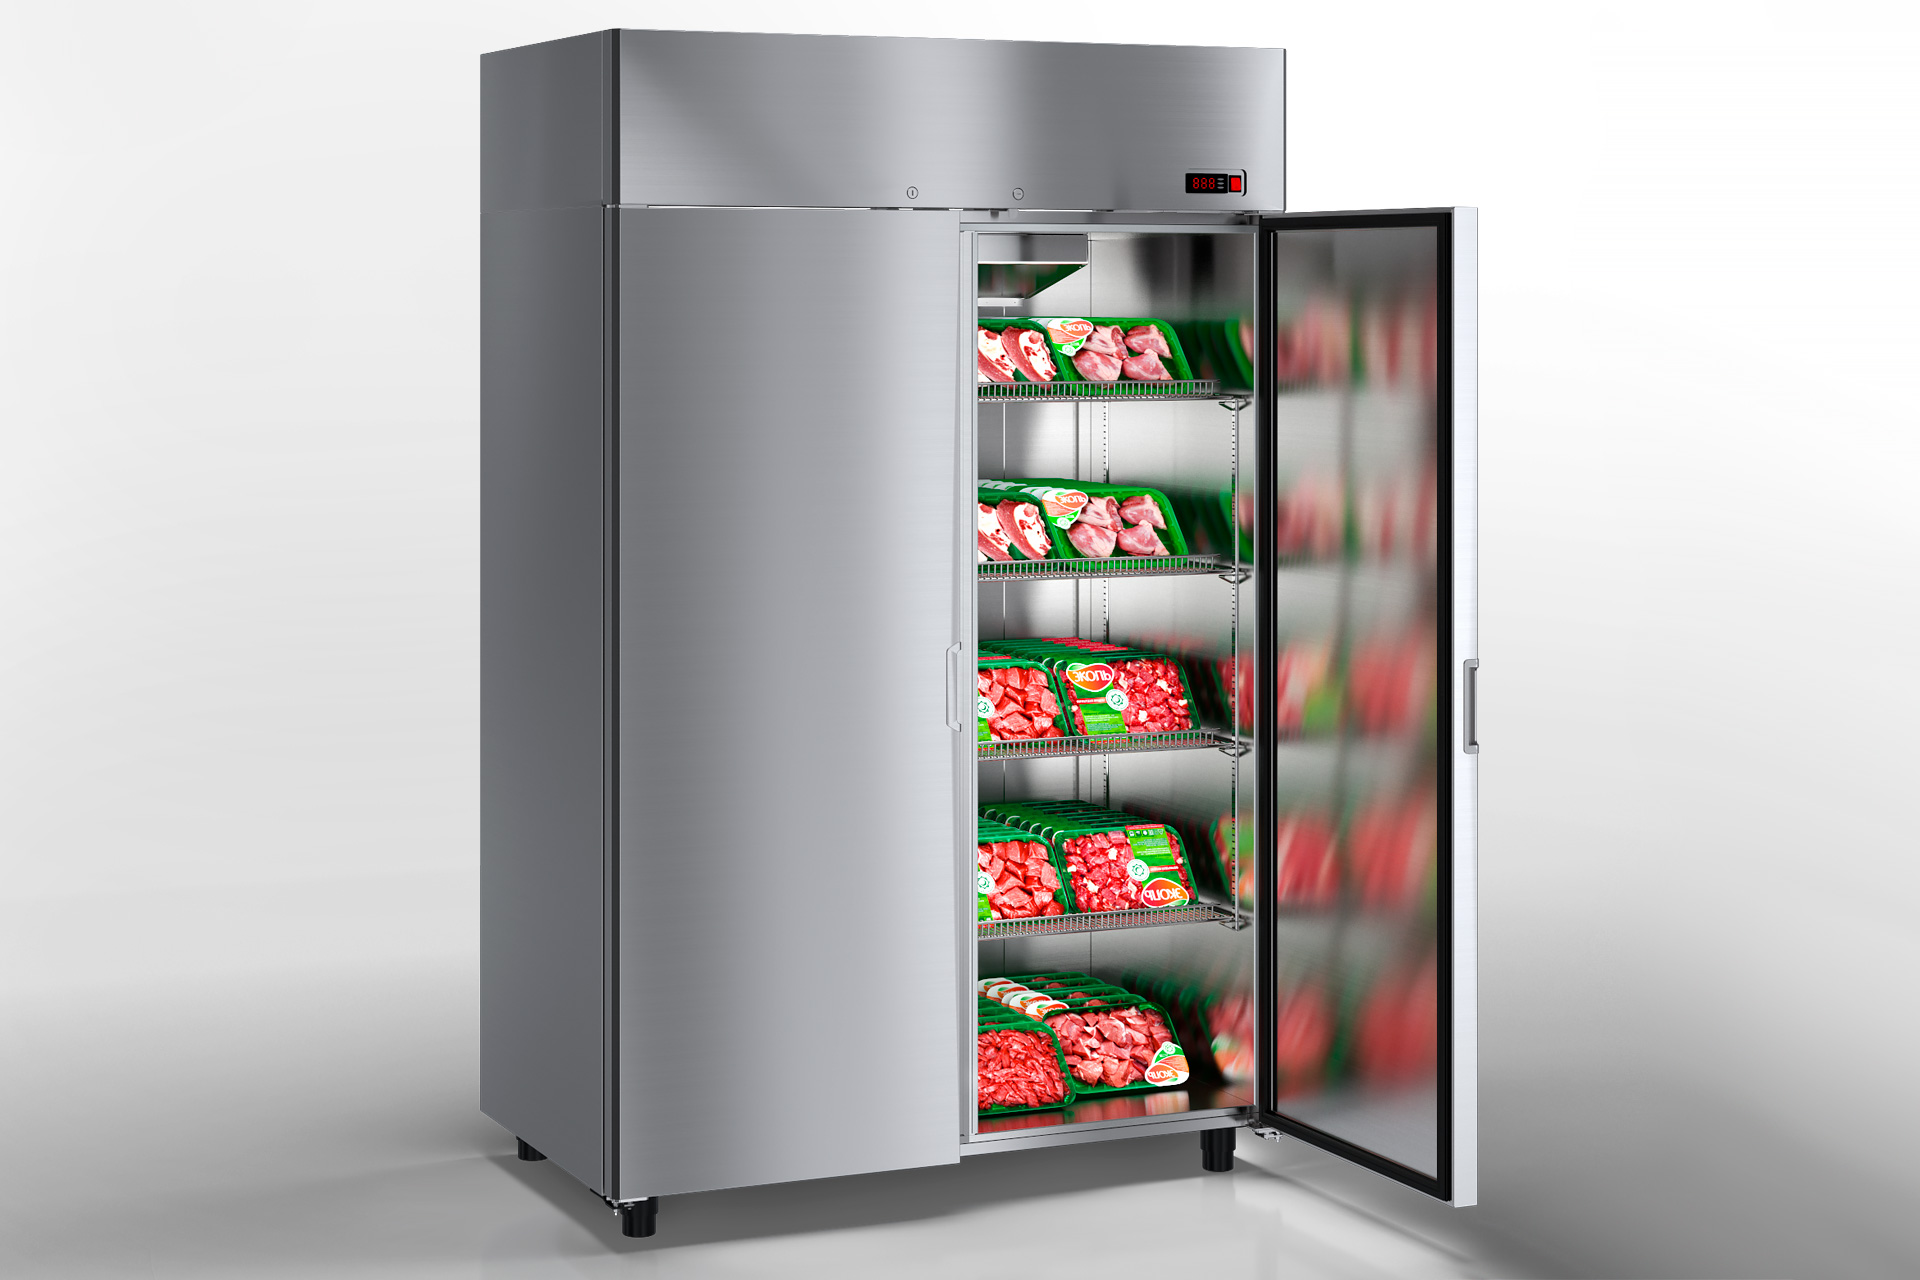 Szafy chłodnicze Kansas VAZG 066/076/086 HT 2HD 210-D1100/D1300/D1500A-132